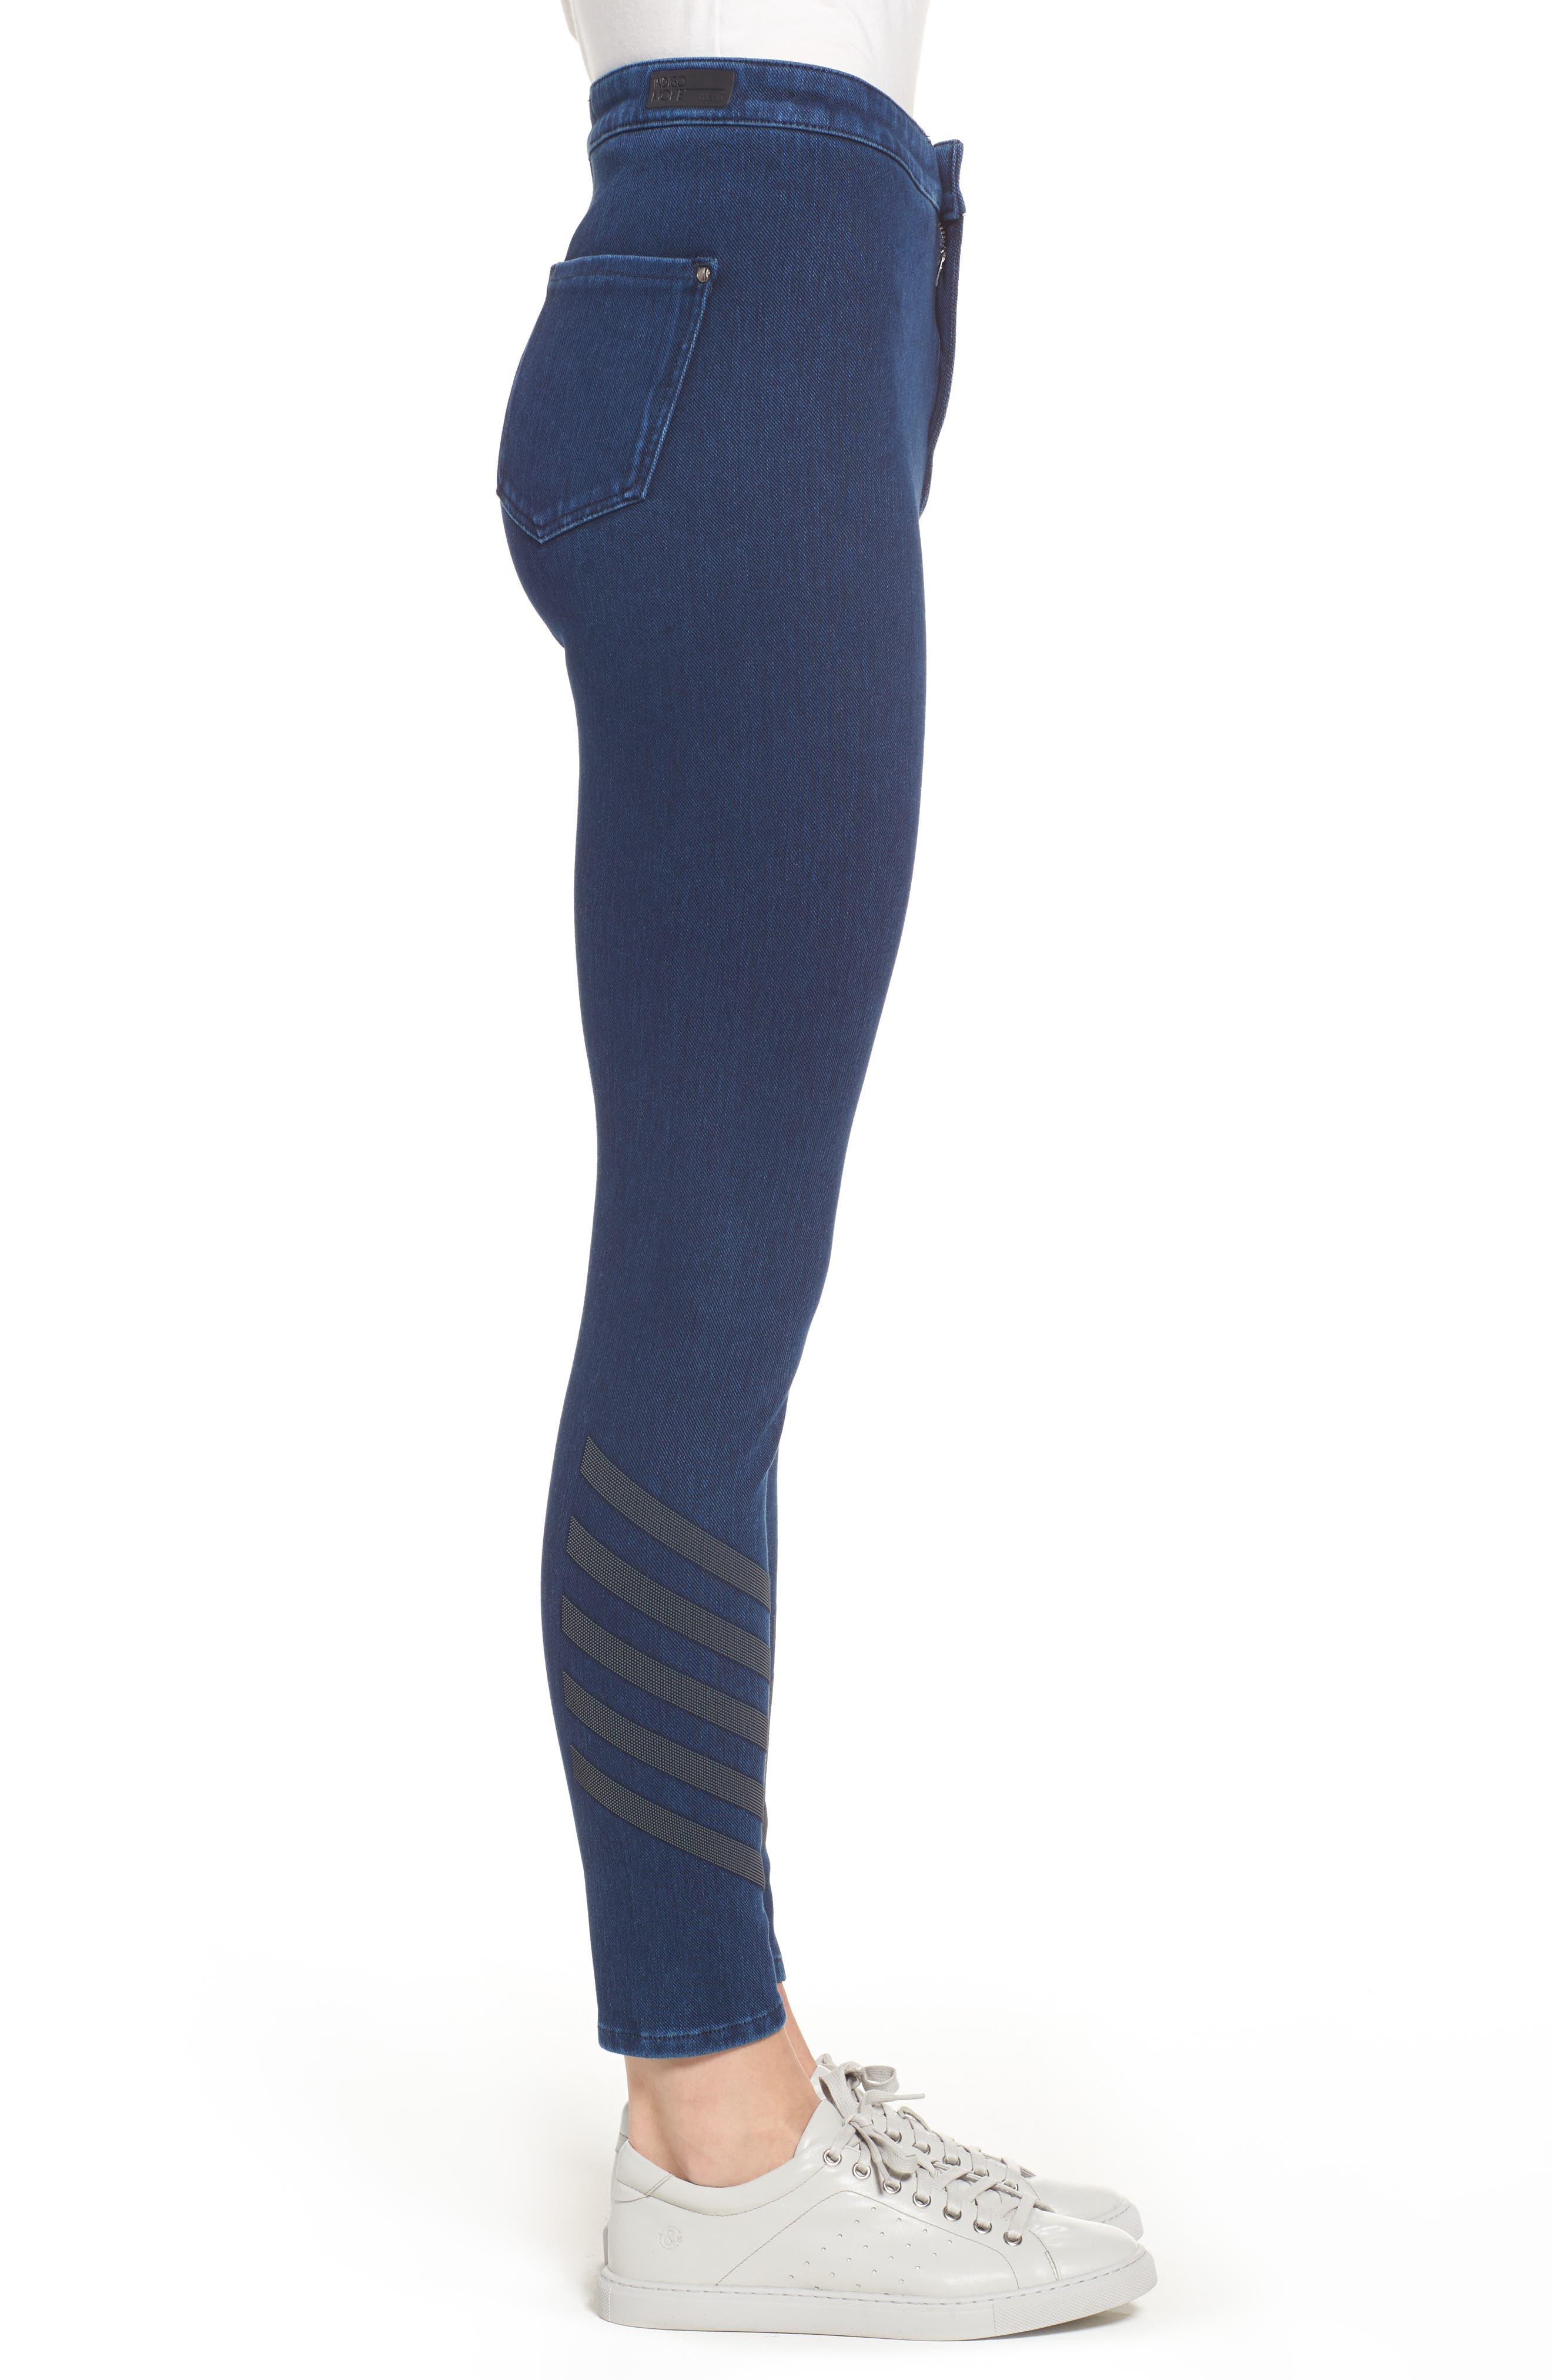 Joie Embellished High Waist Skinny Jeans,                             Alternate thumbnail 3, color,                             401